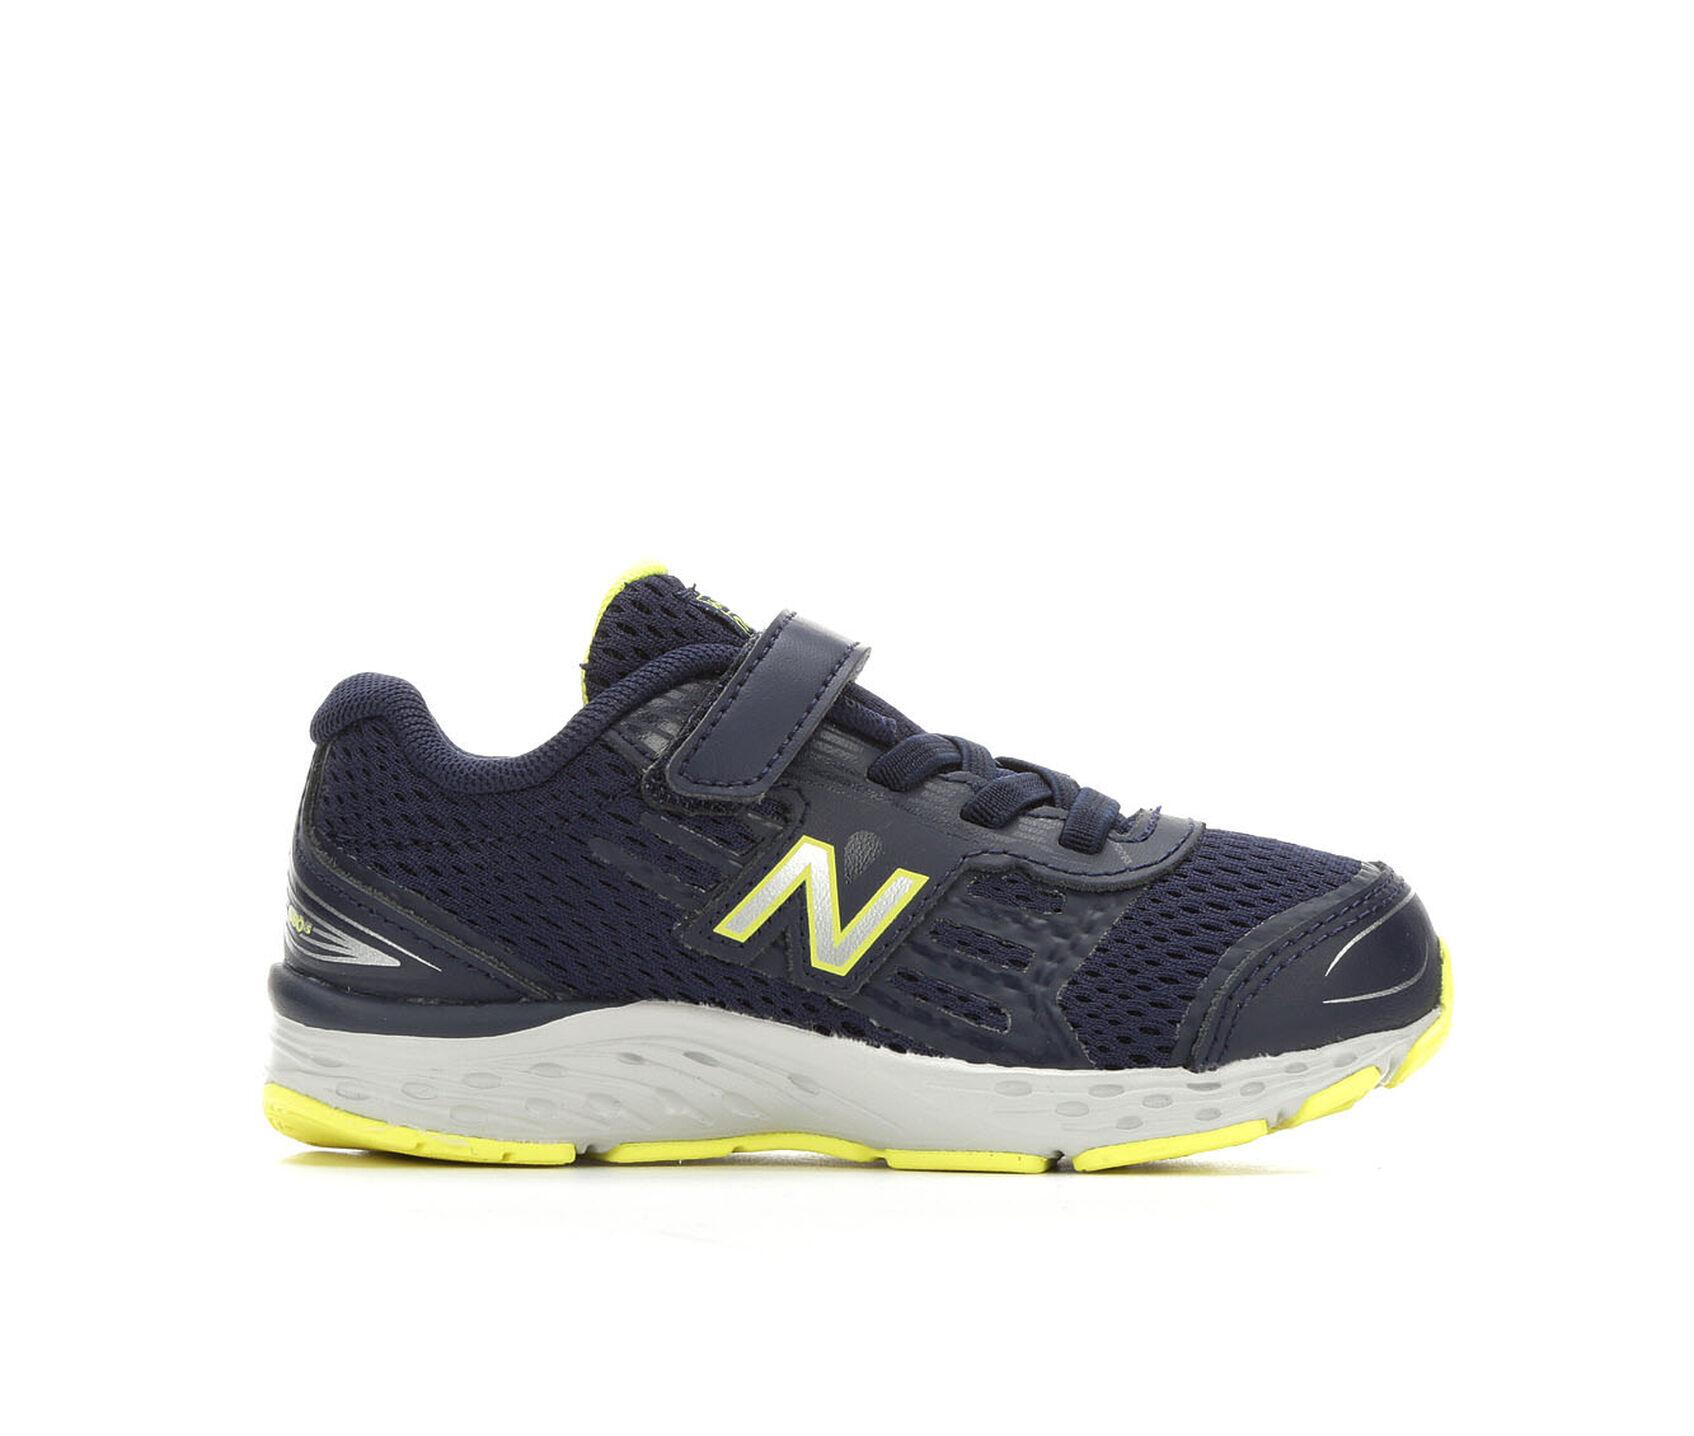 ... New Balance Toddler KA680PLI Wide Athletic Shoes. Carousel Controls 5ecb5684ba3d